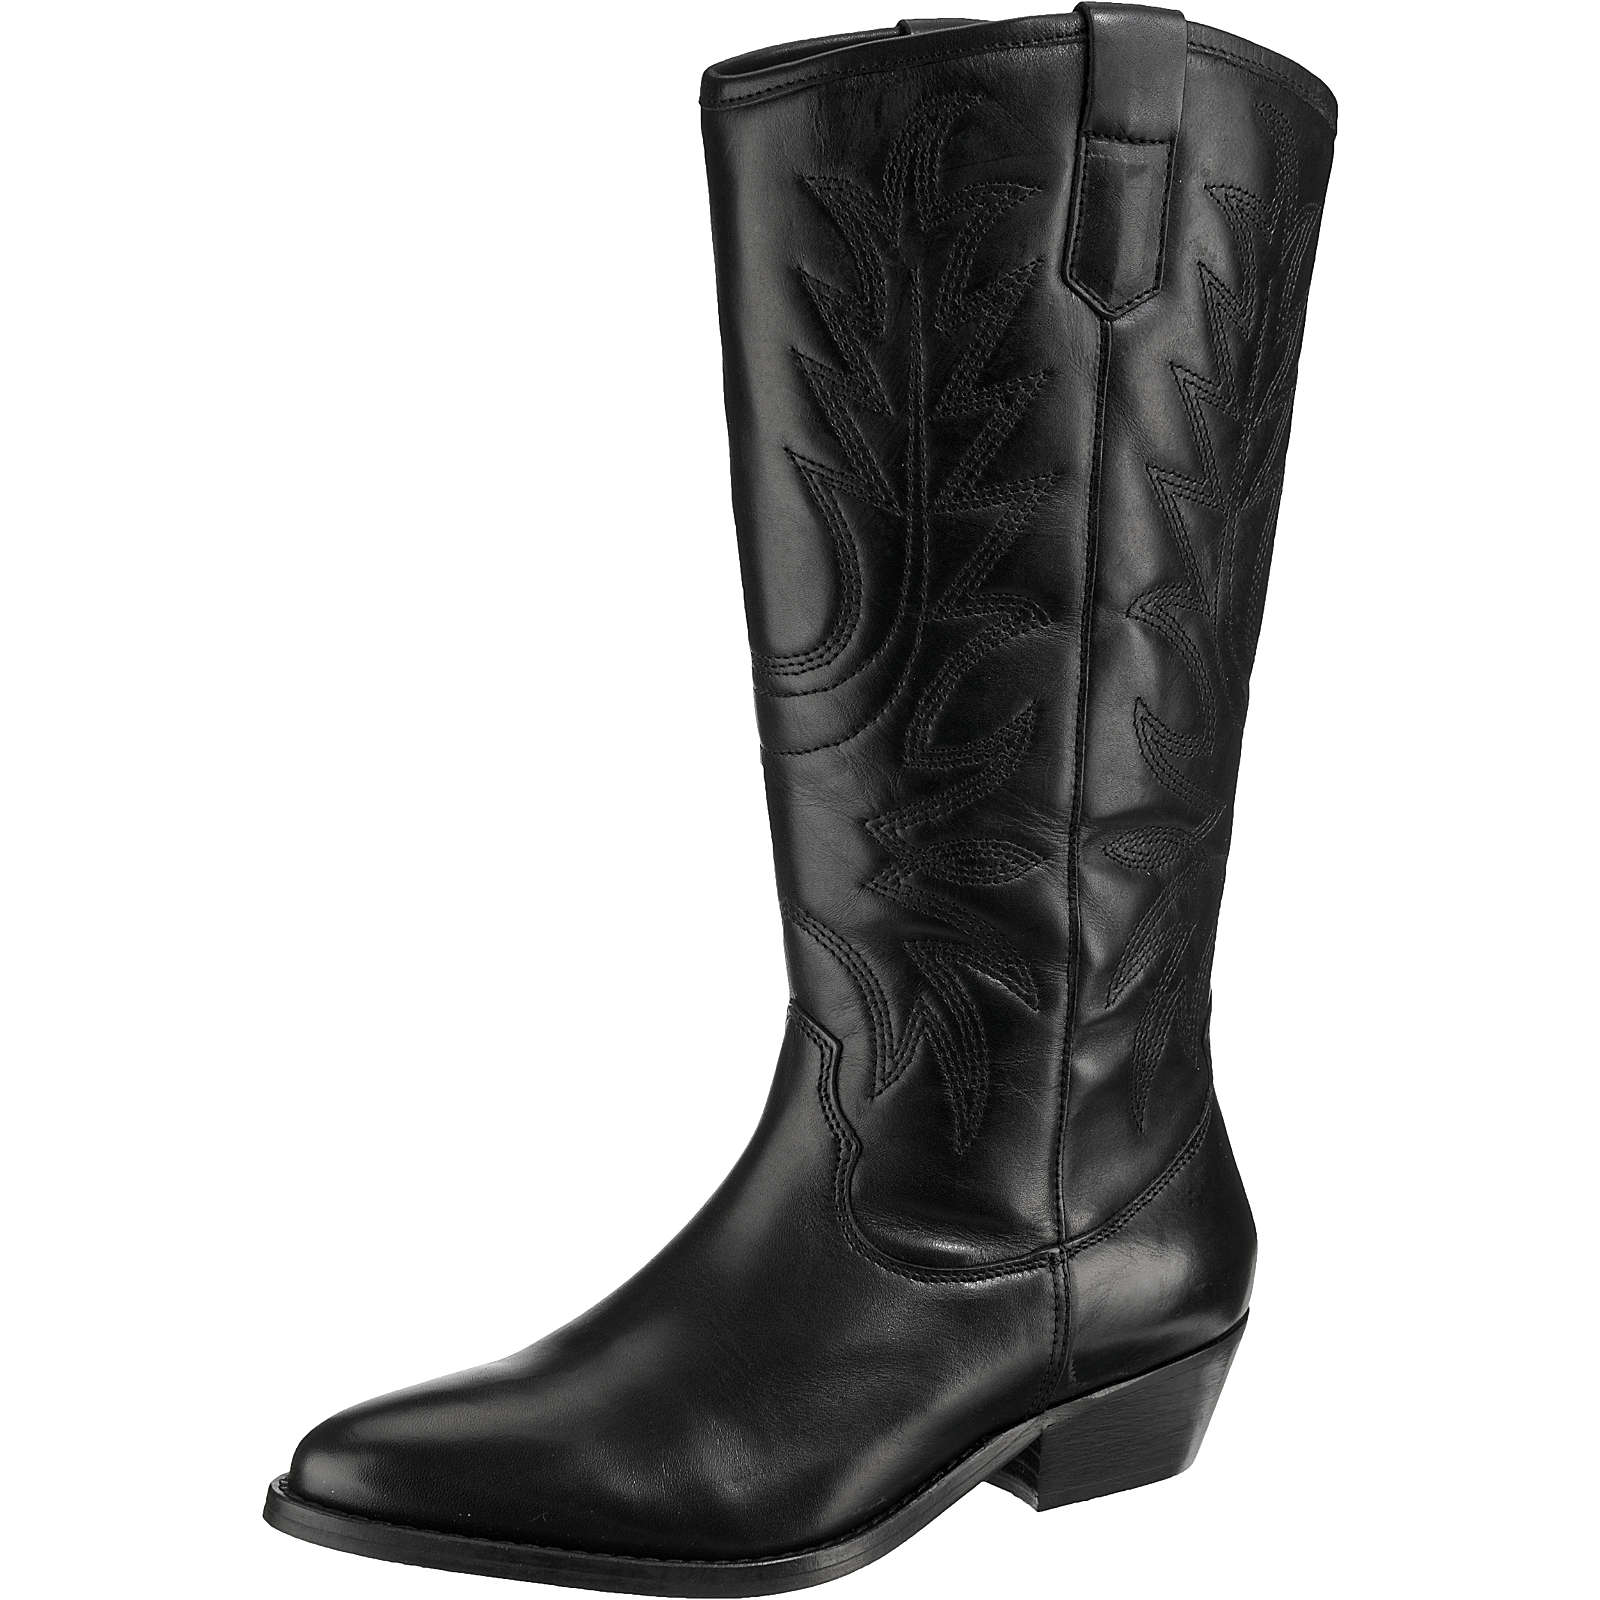 BULLBOXER Klassische Stiefel schwarz Damen Gr. 41